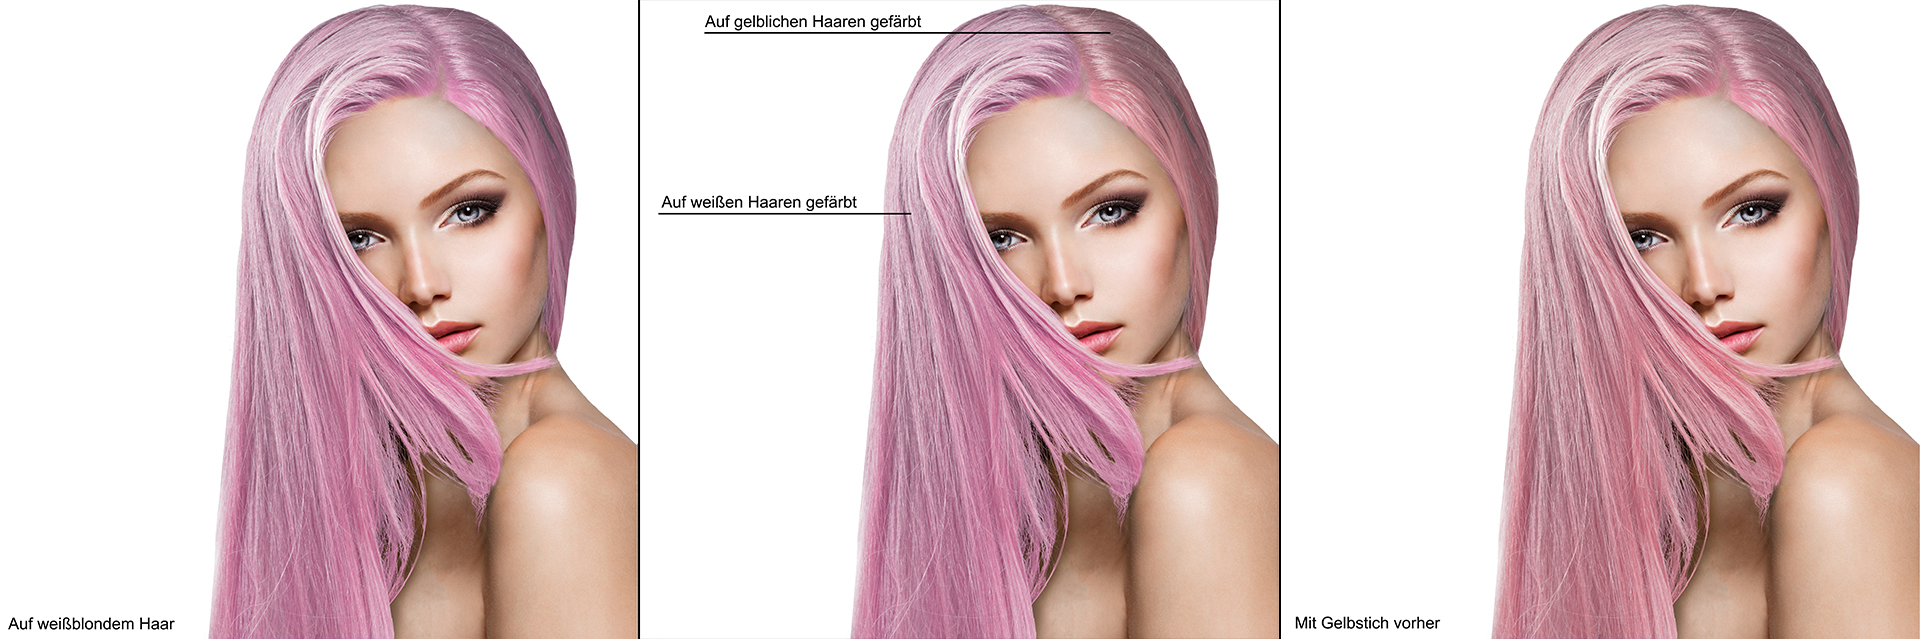 Erkl-rreihe-Pink-s-Not-Dead